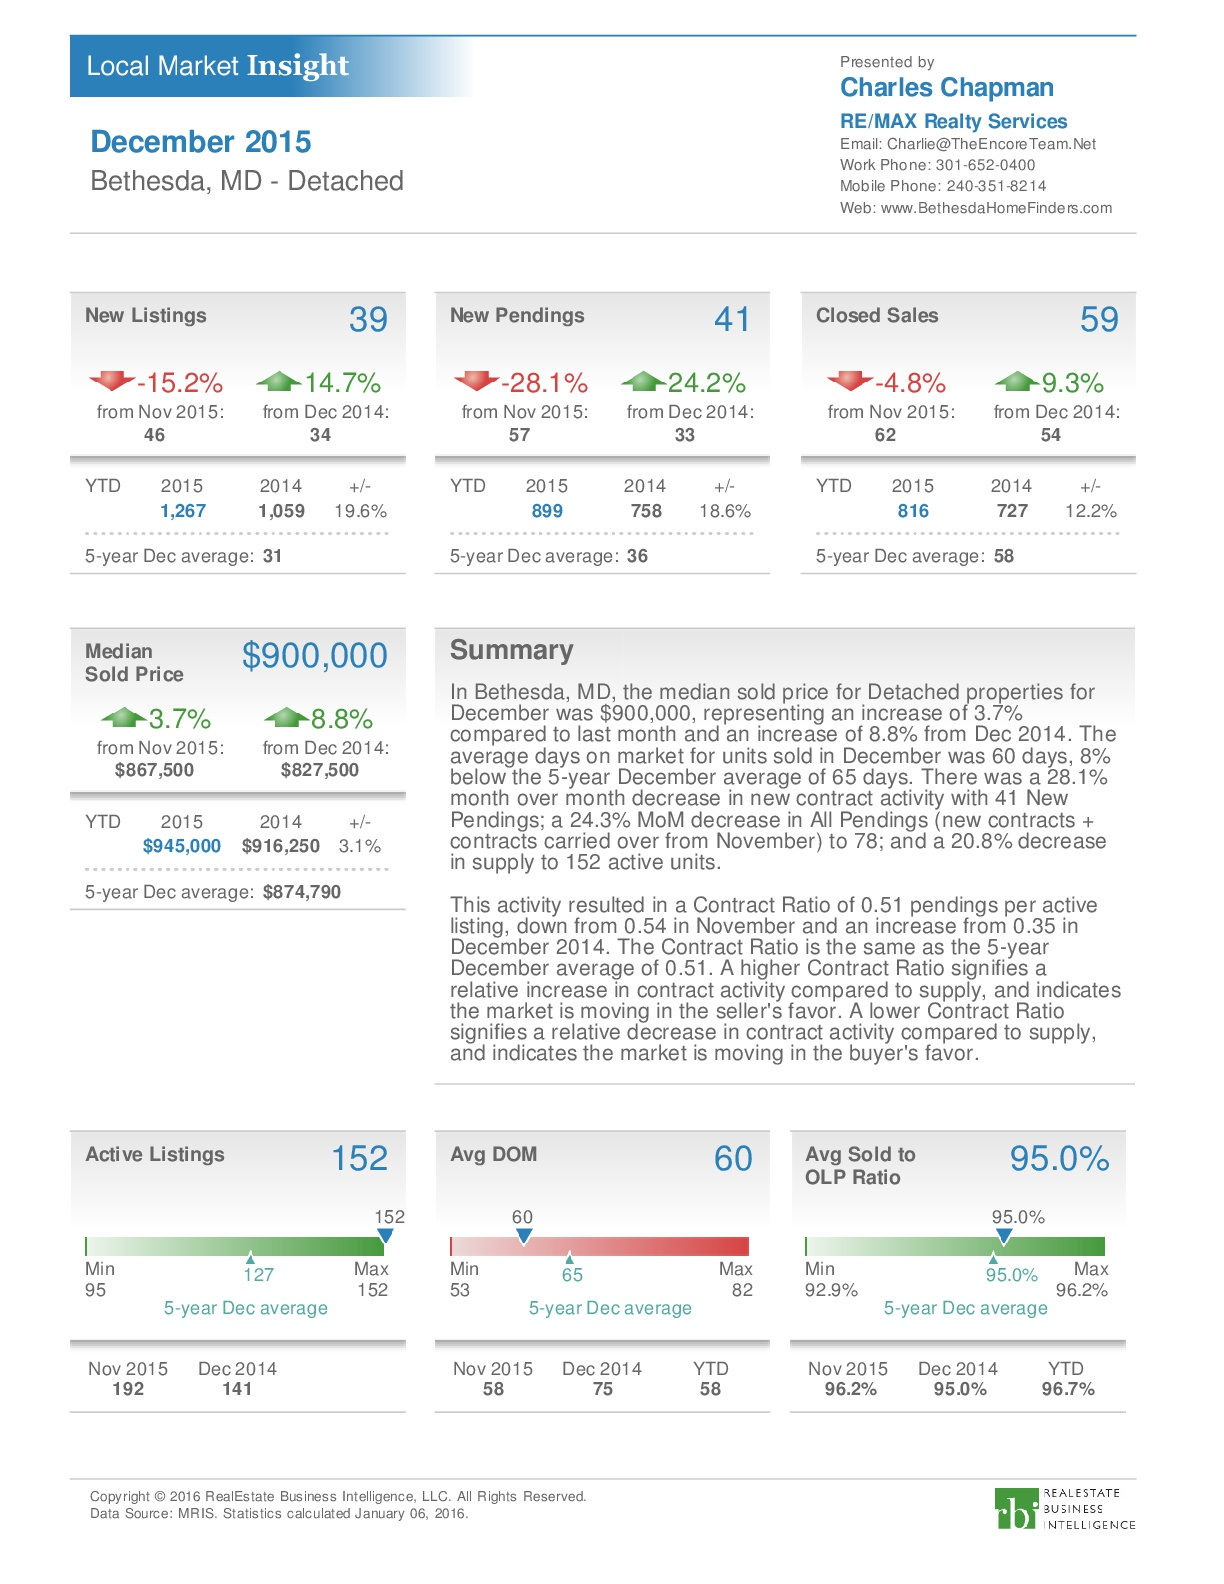 Bethesda Dec 2015 Market Rpt